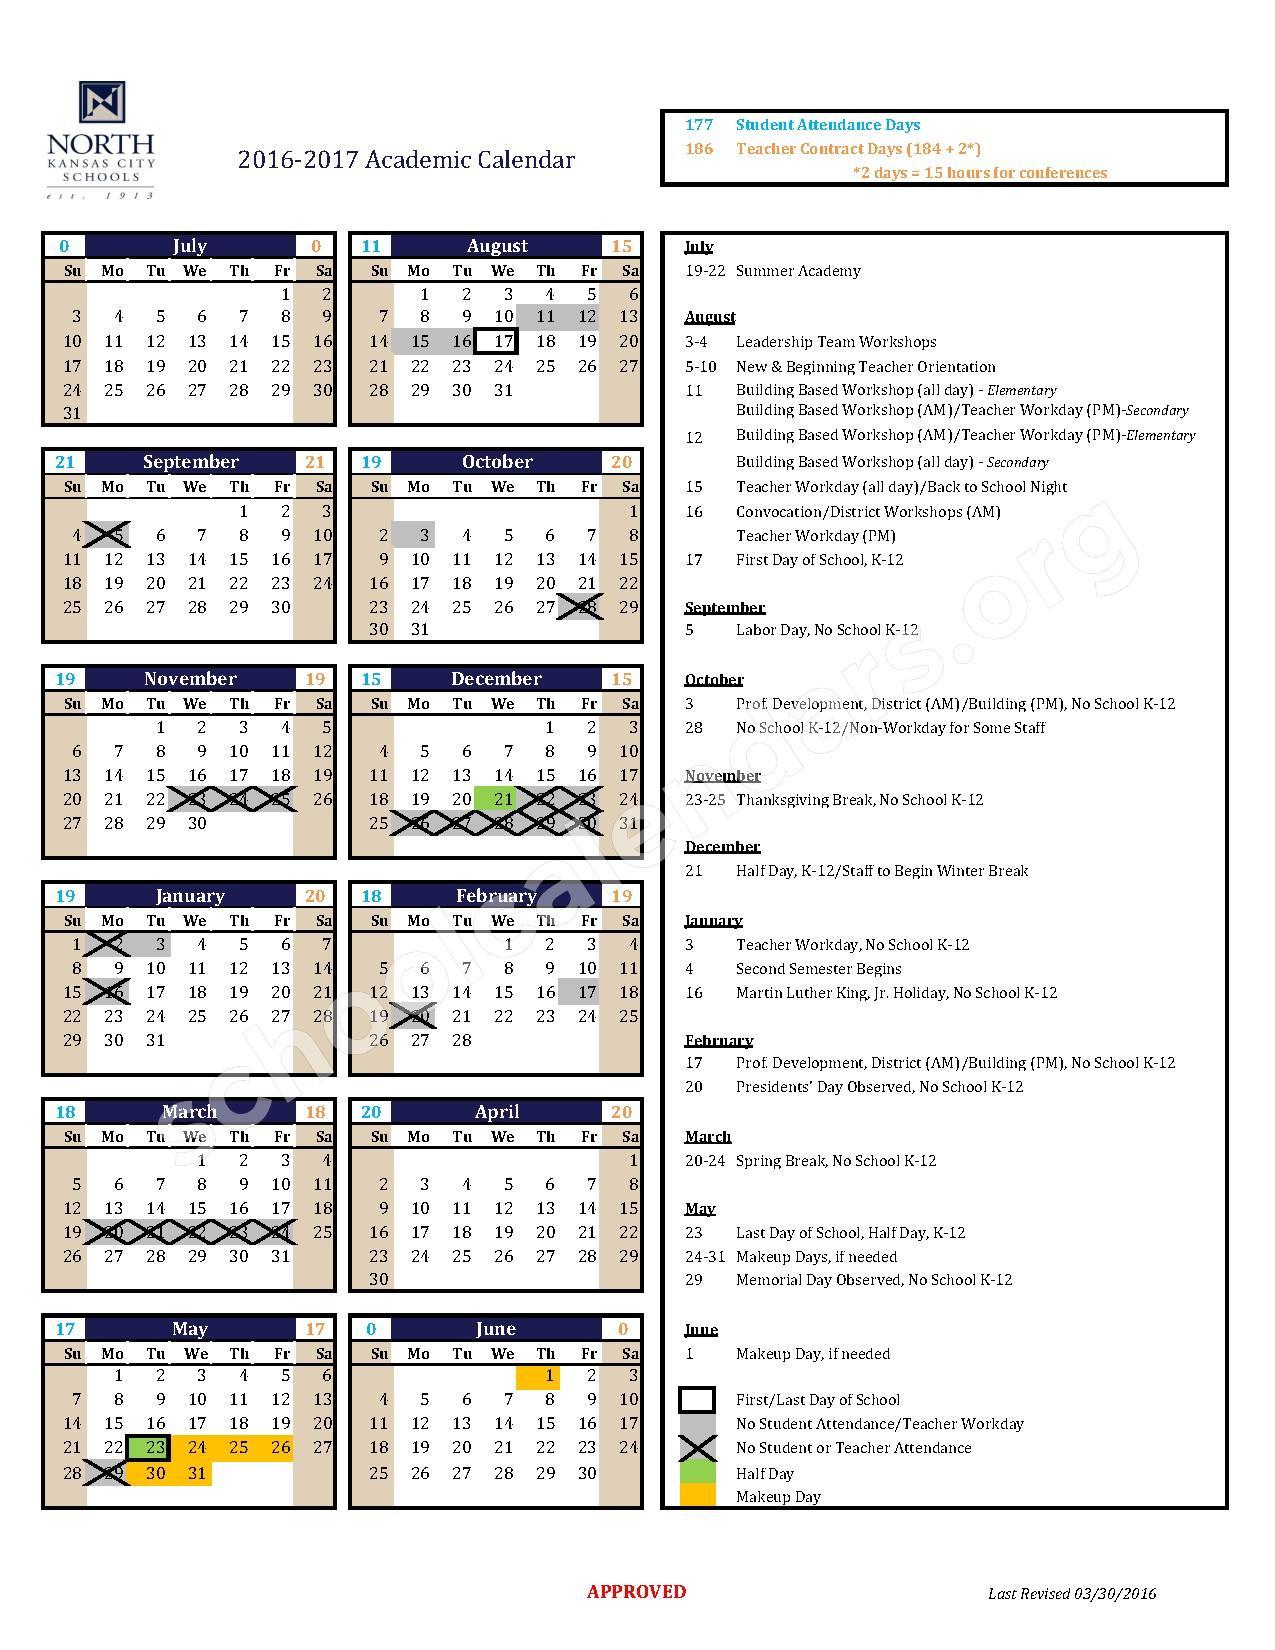 Delaware State University Calendar 2021 | Printable throughout Uri Academic Calendar